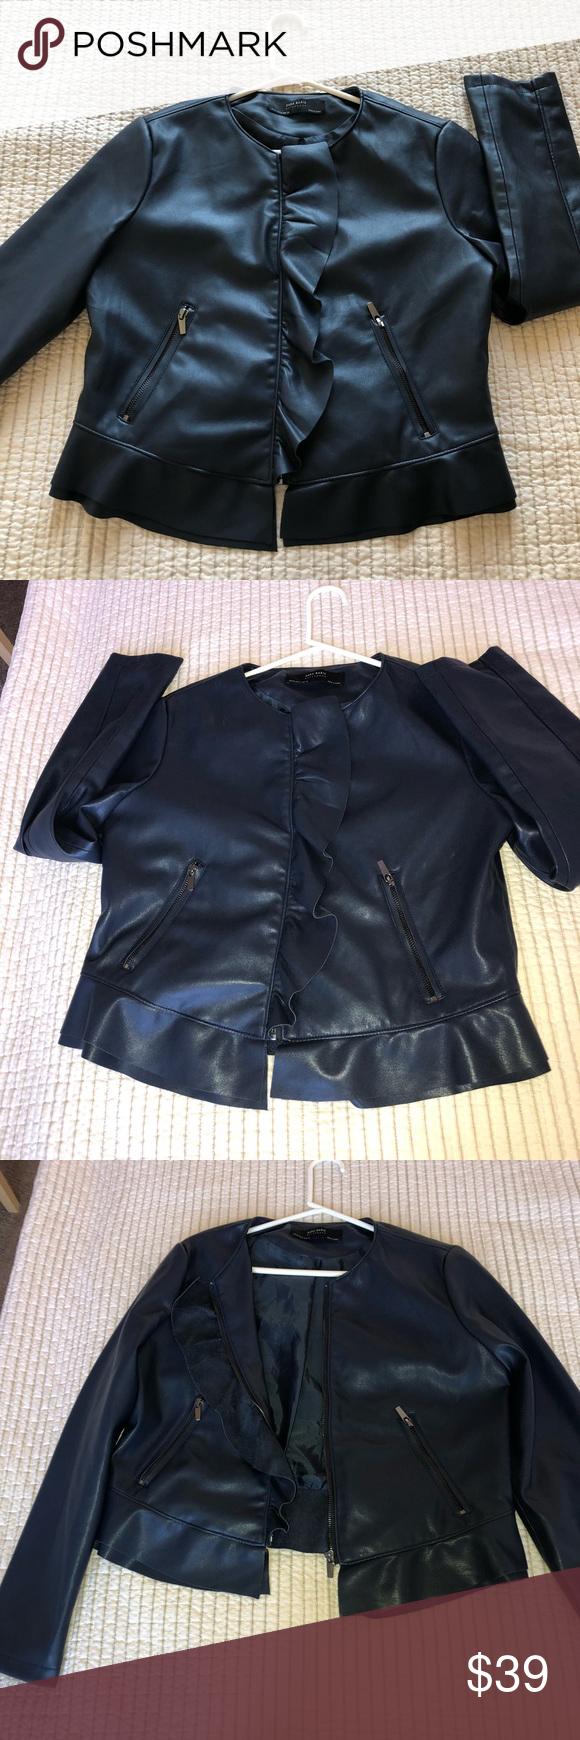 Zara Navy Blue Faux aka Vegan Leather Jacket 2017 Vegan